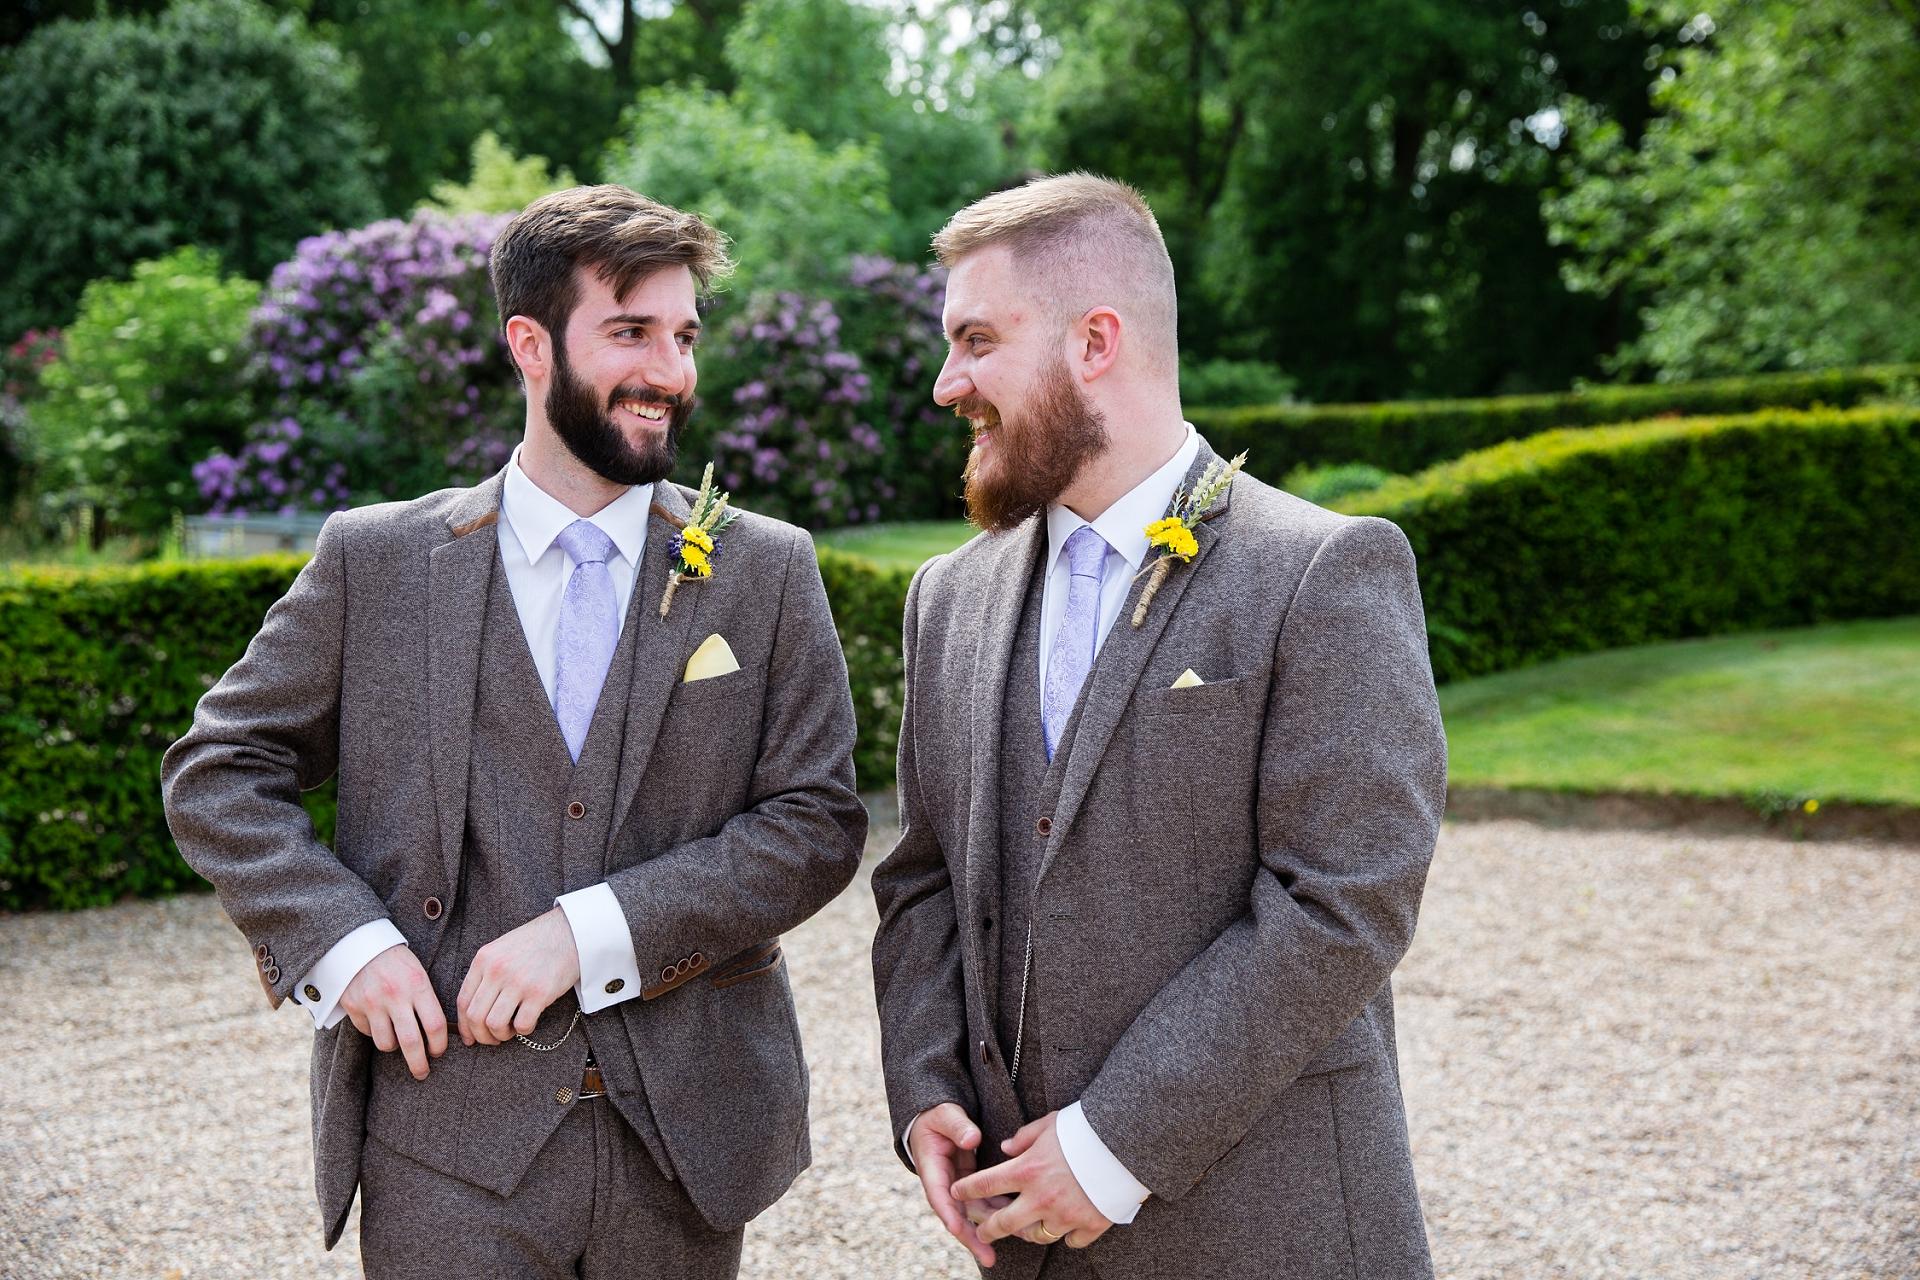 1940's style groom